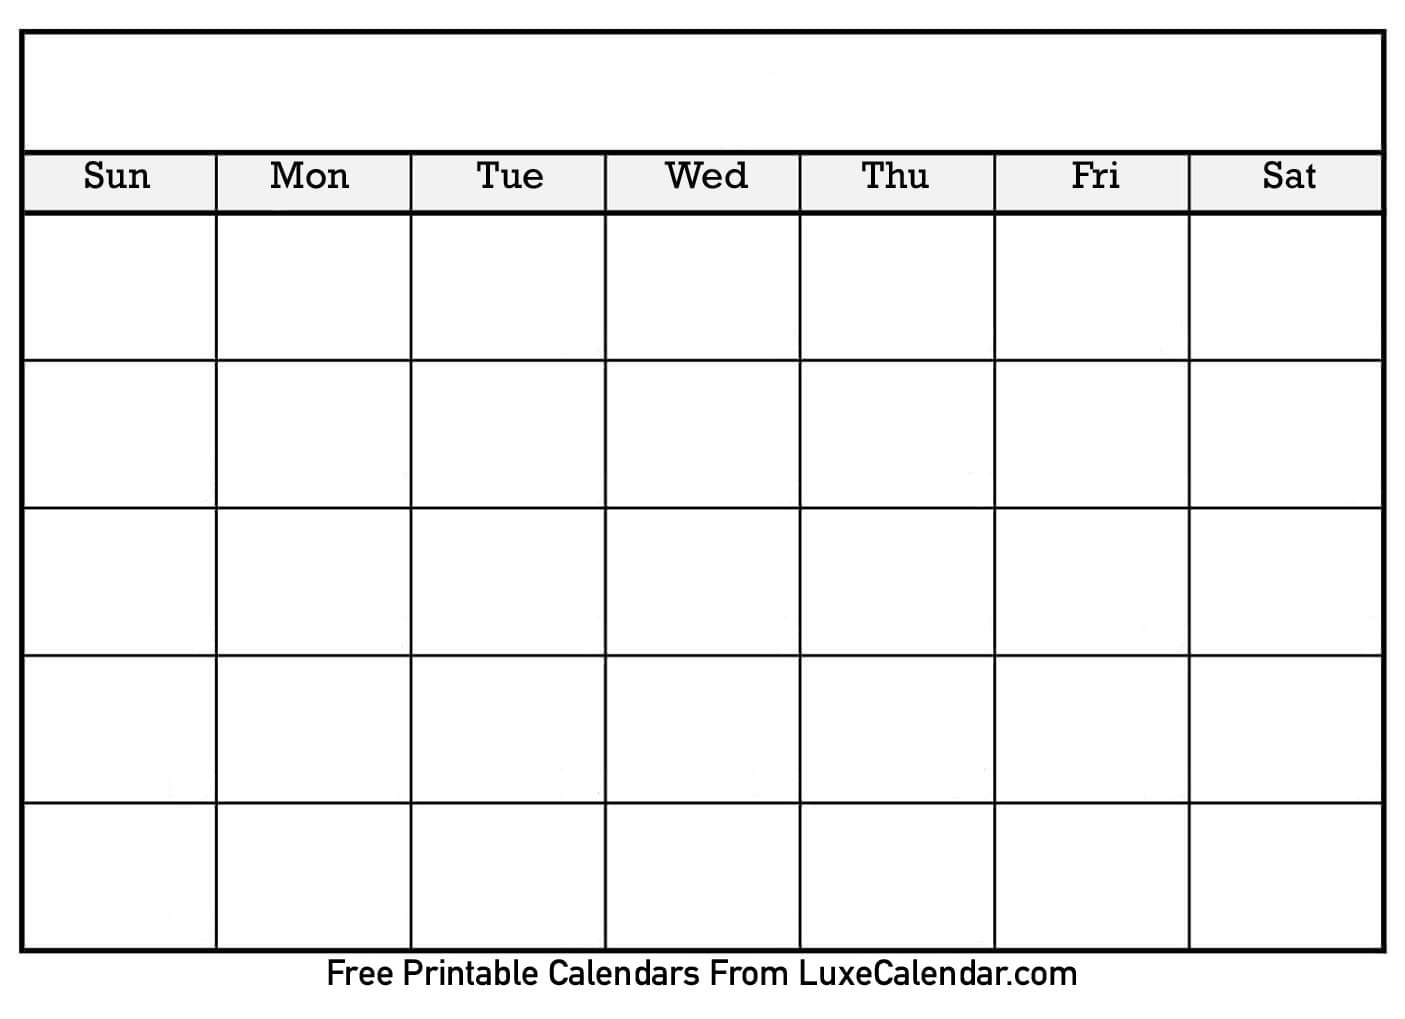 Blank Printable Calendar  Luxe Calendar In Blank Calender Template